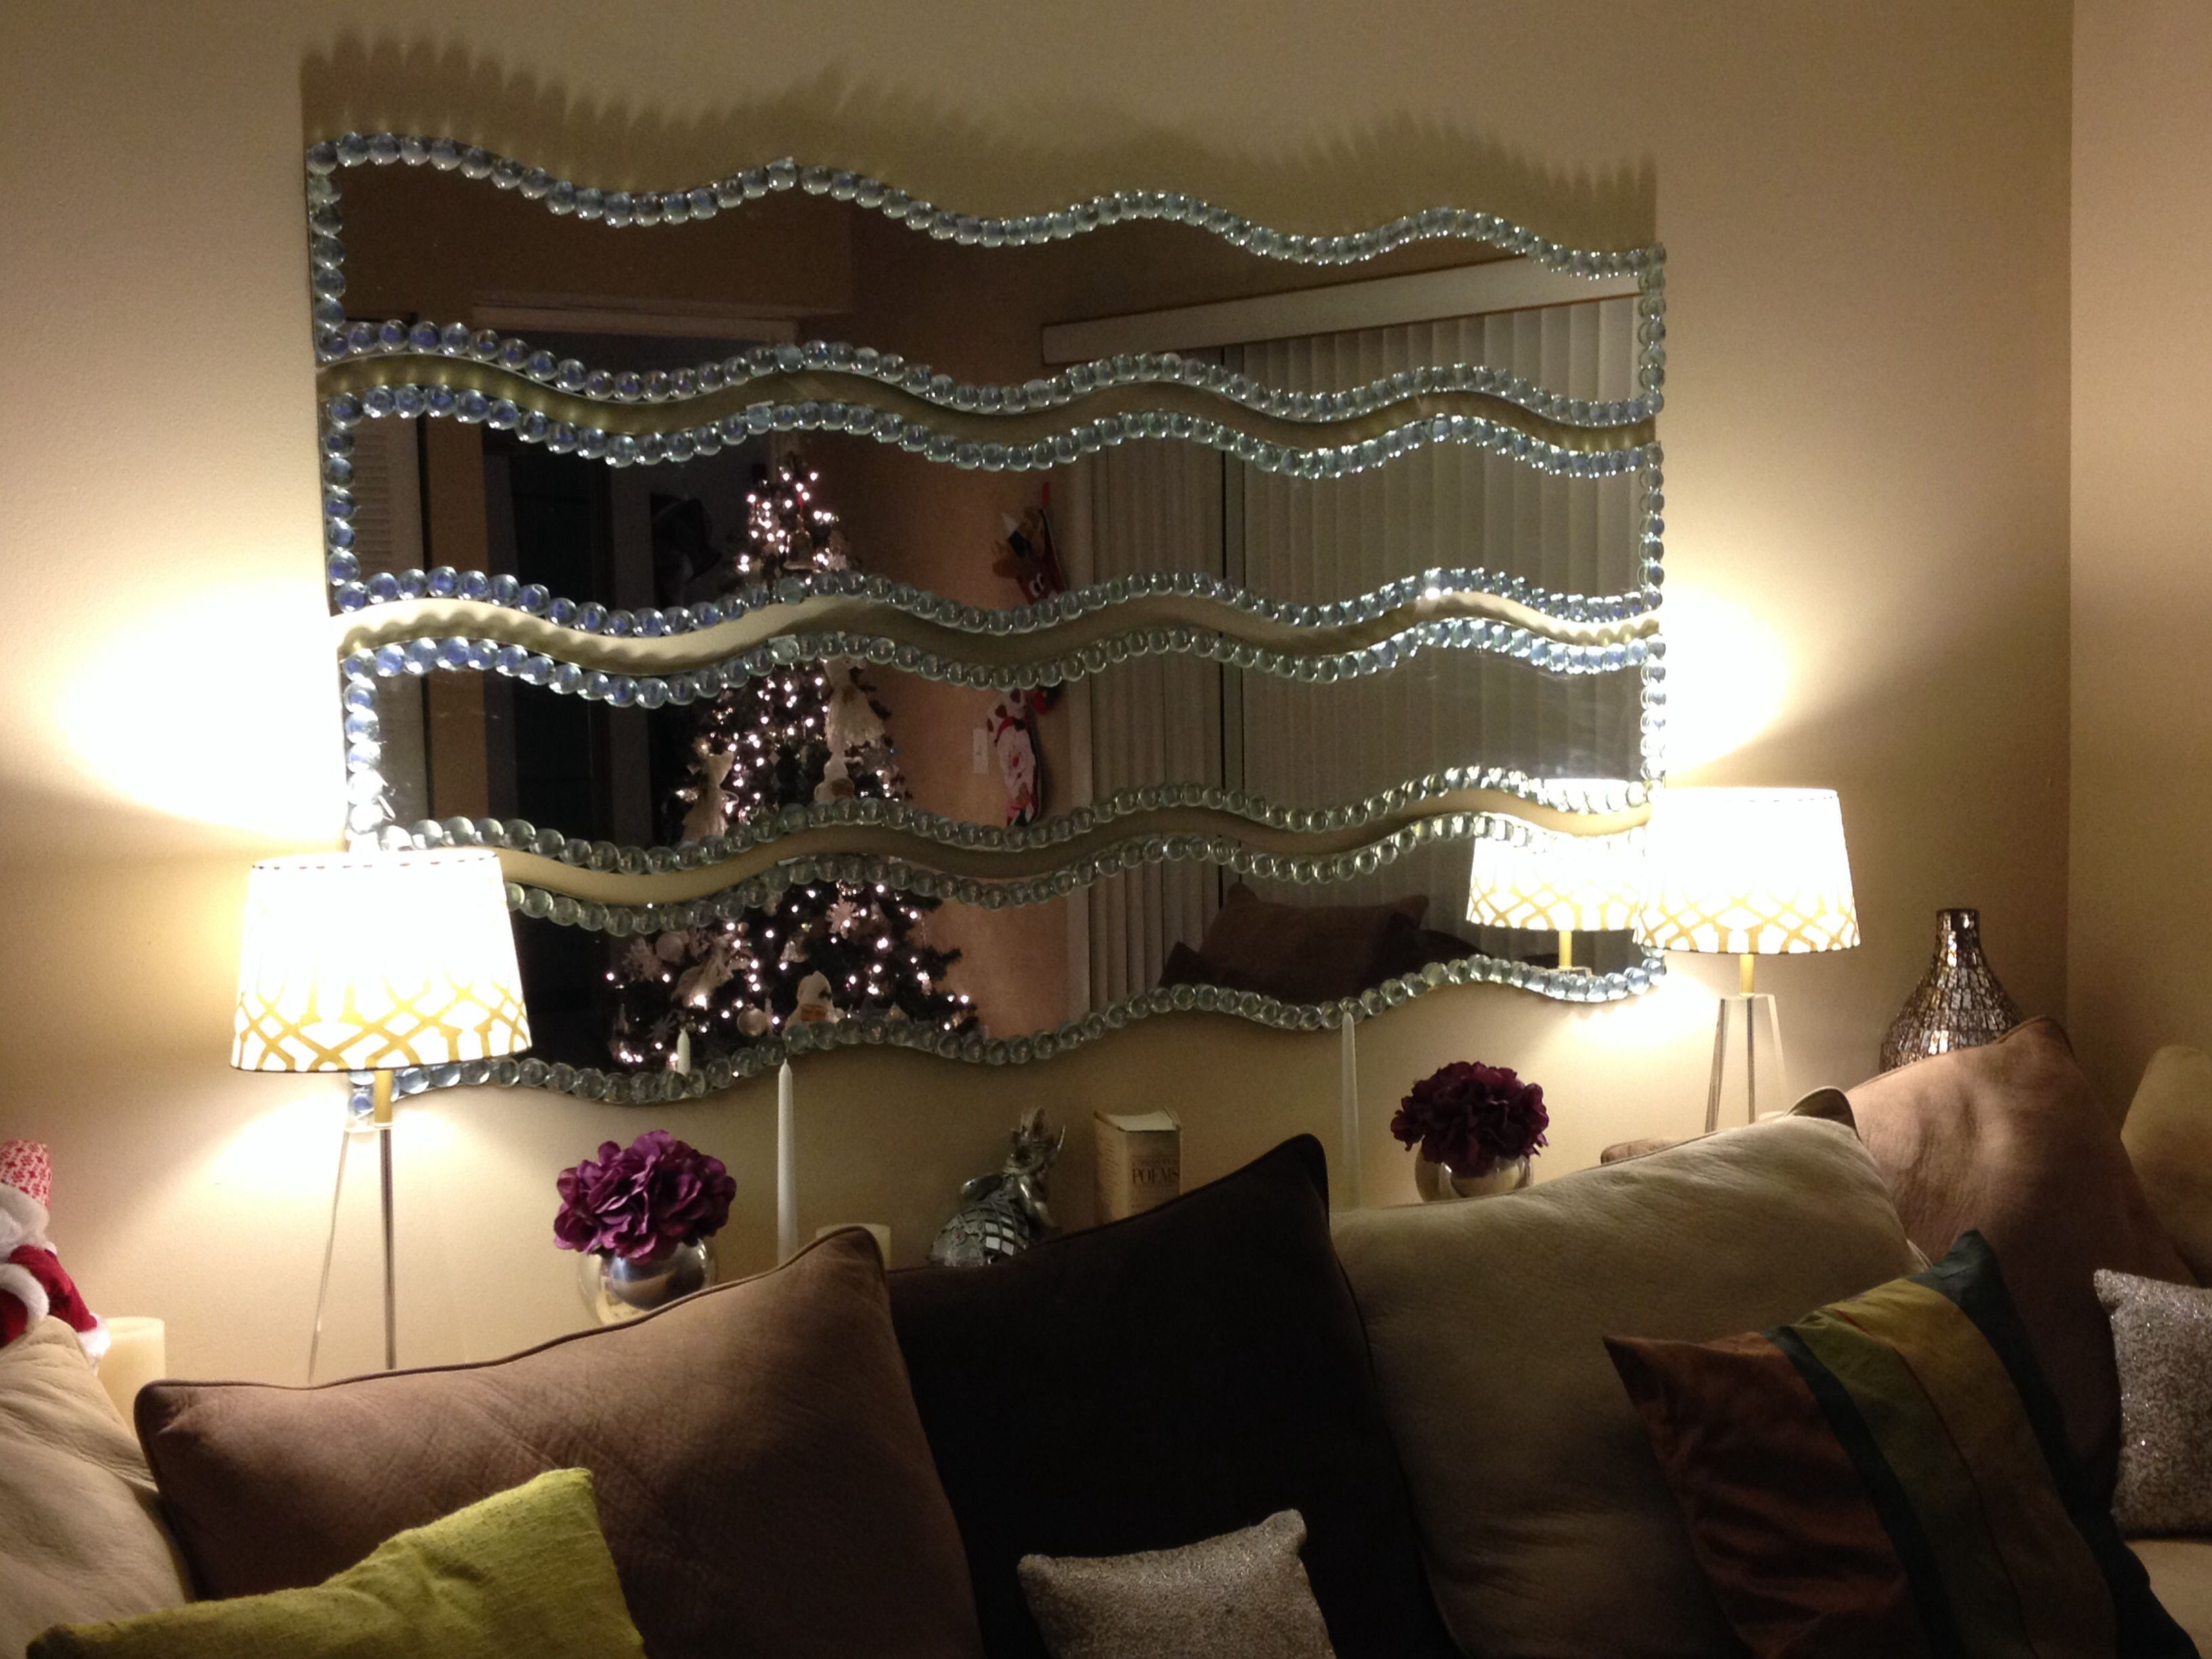 Ikea krabb mirrors jazzed up with flat clear marbles for Miroir krabb ikea